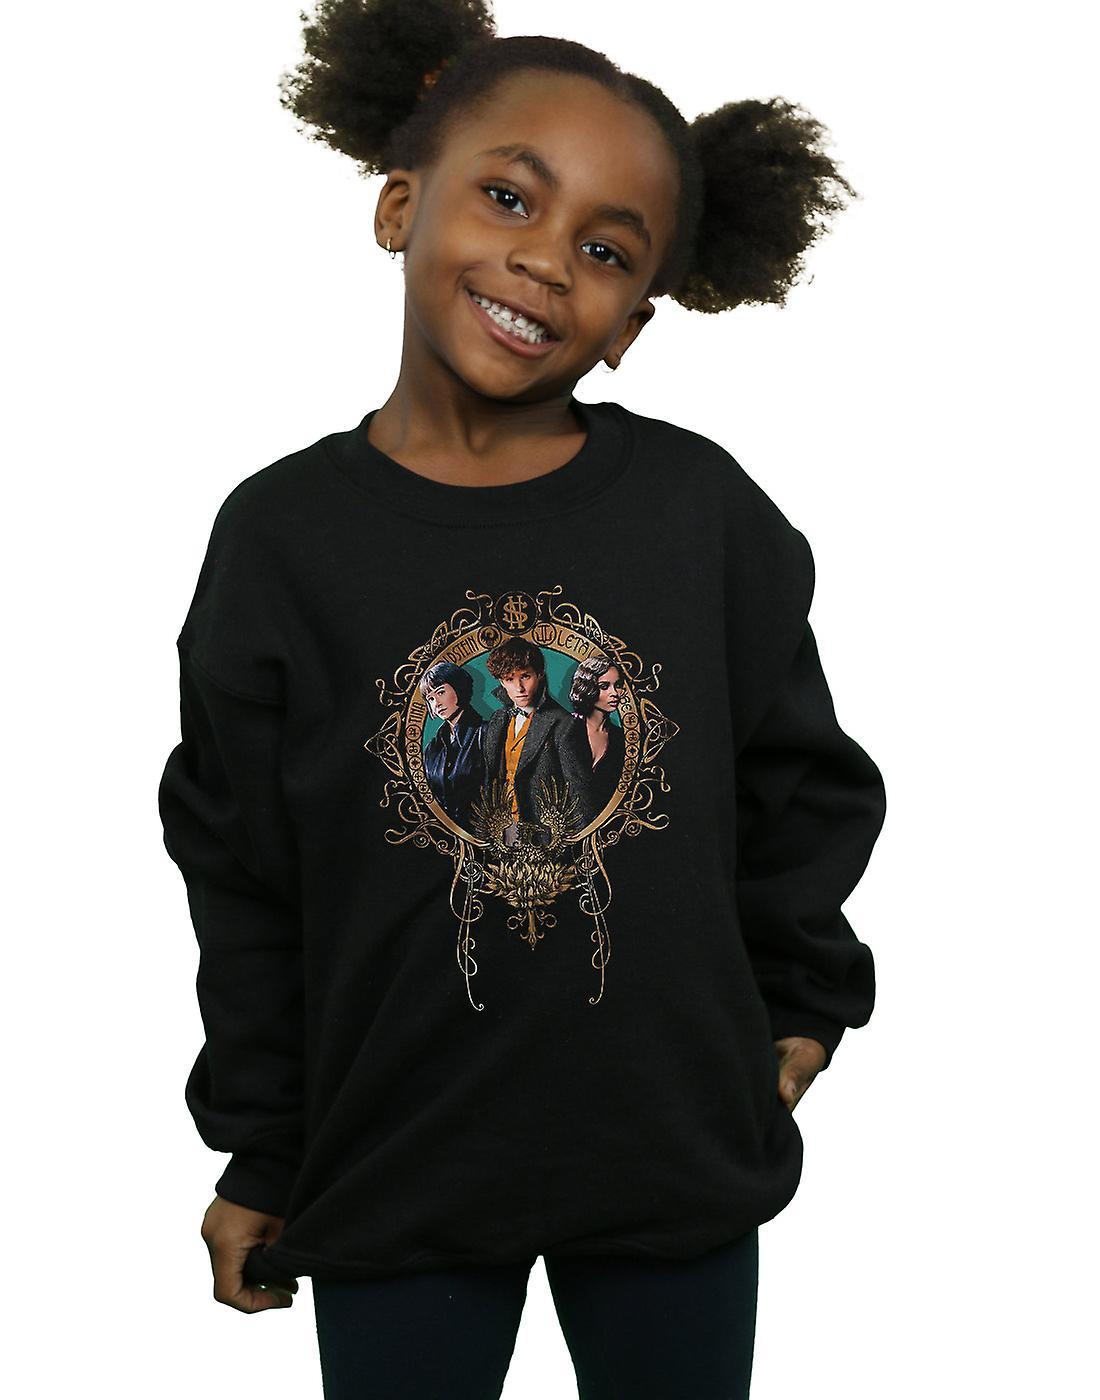 Fantastic Beasts Girls Tina, Newt And Leta Sweatshirt